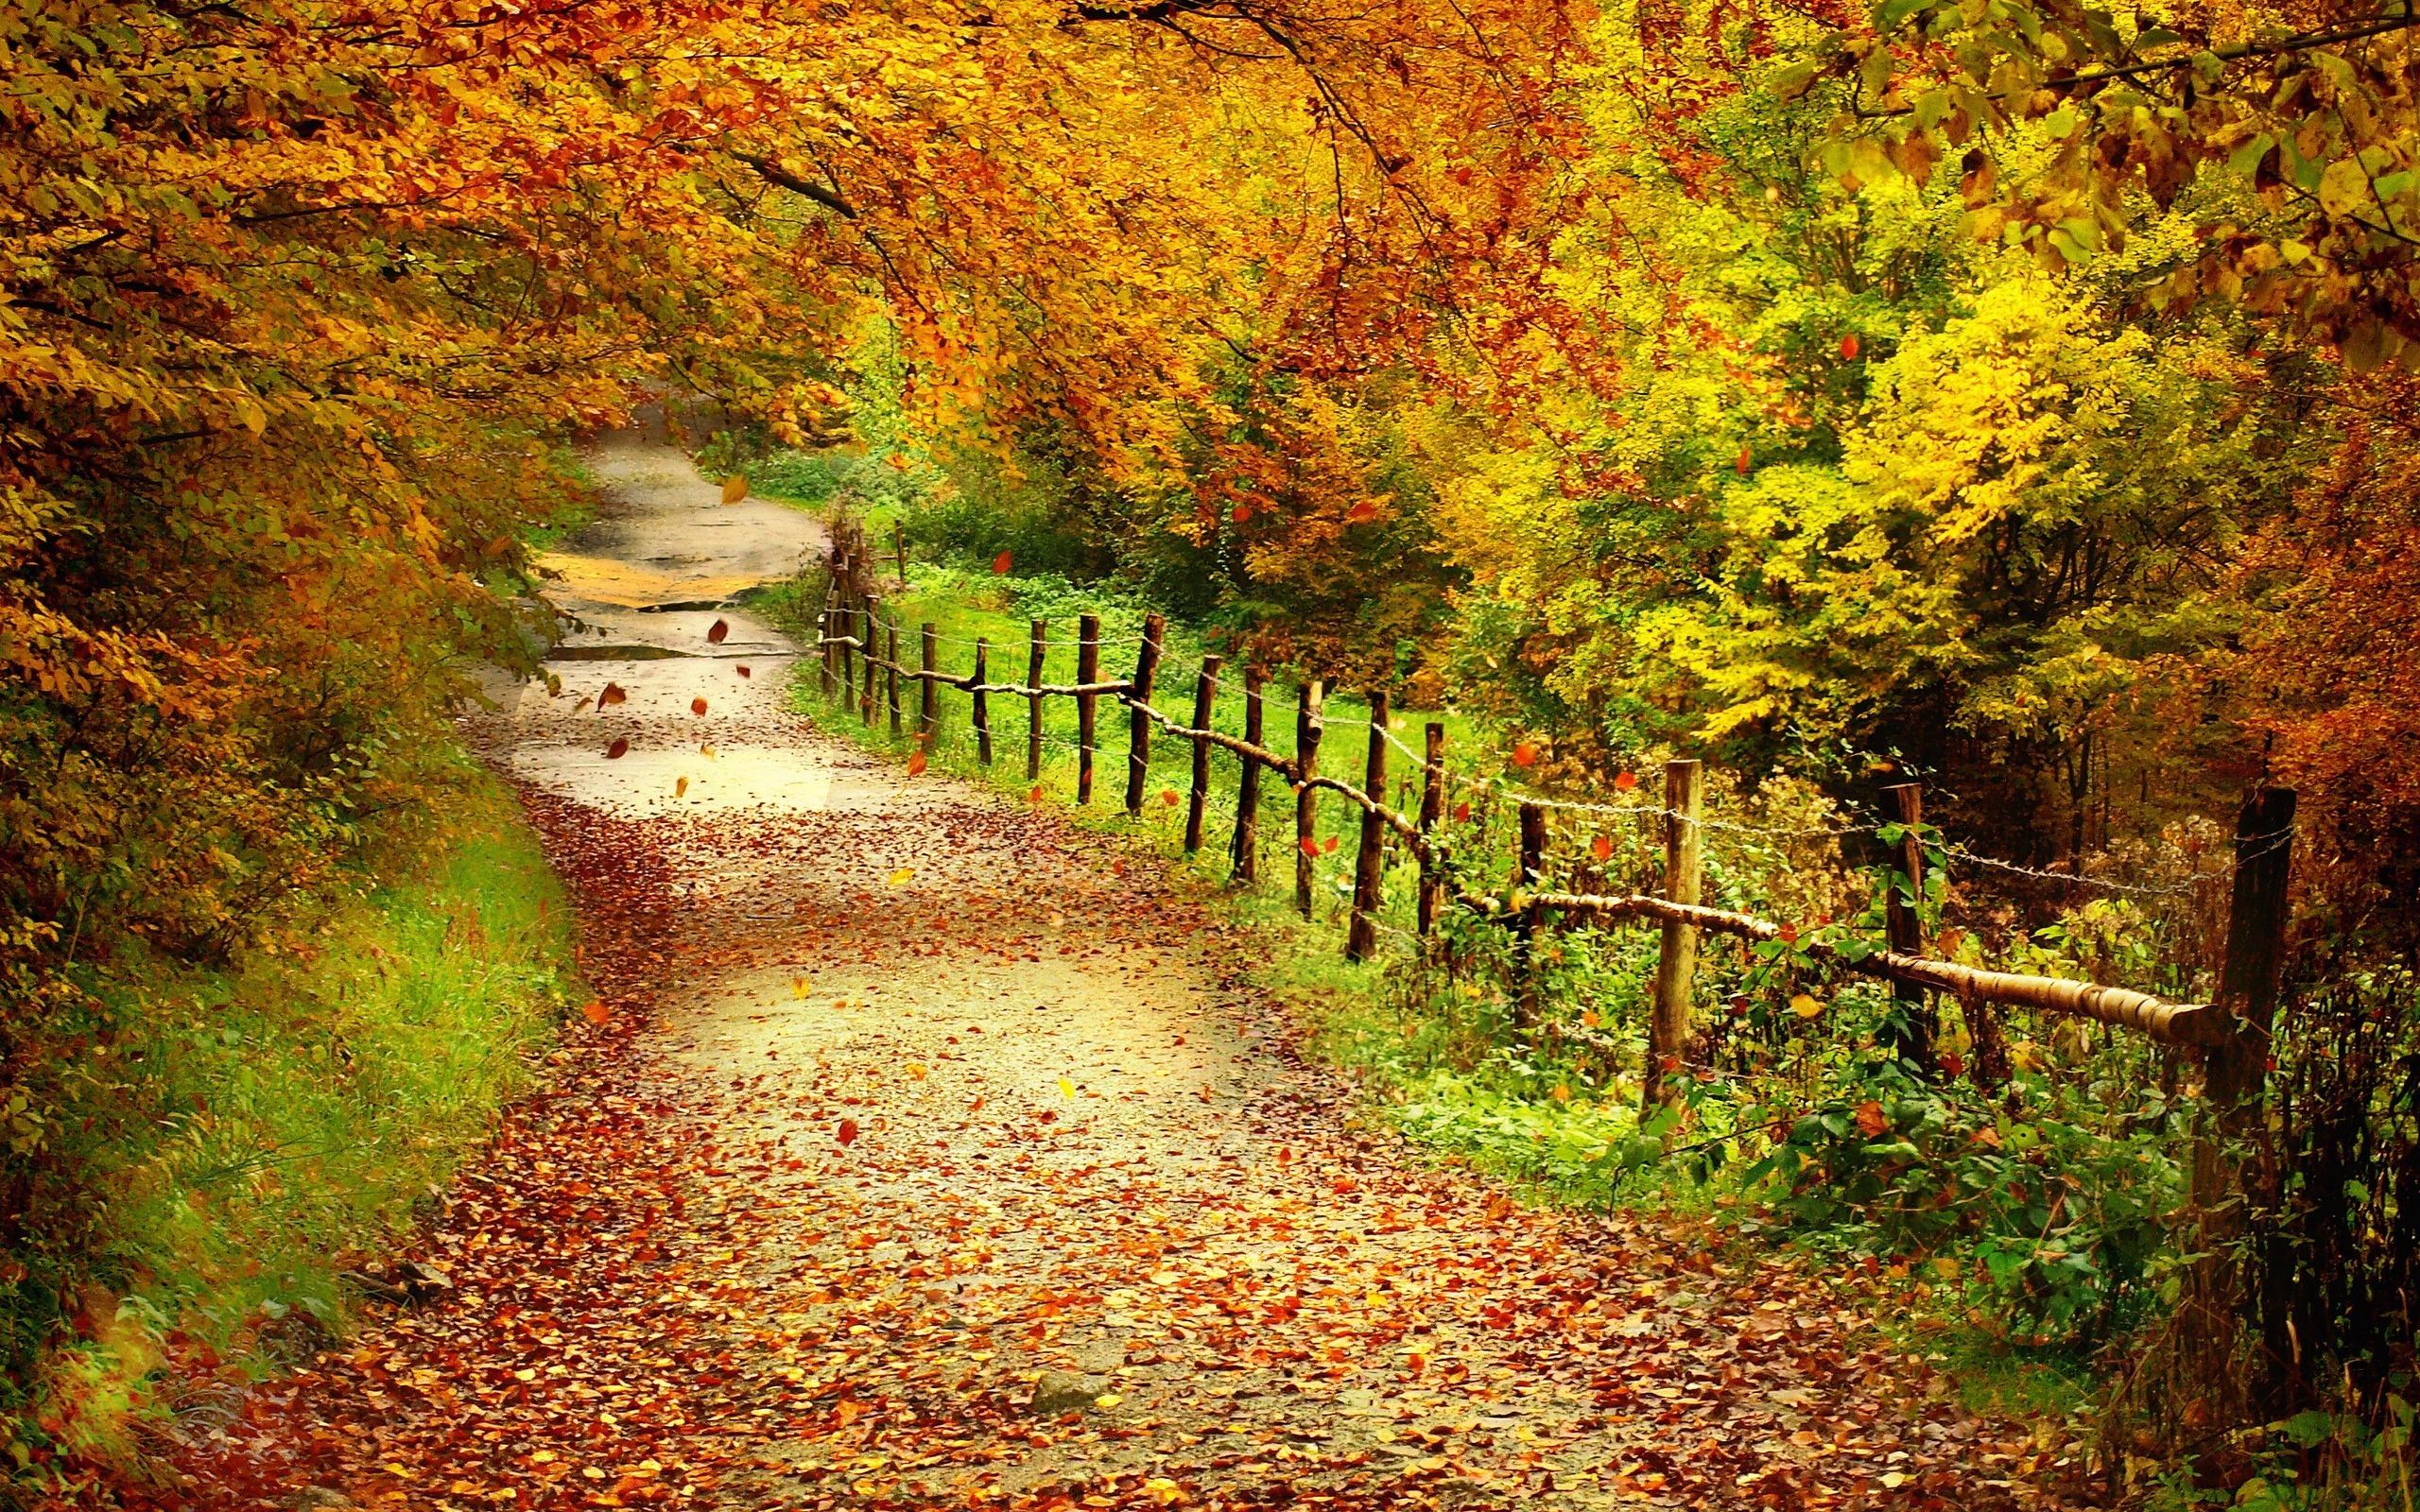 Fall Leaves Pathway Computer Wallpaper Autumn Scenes Desktop Wallpaper